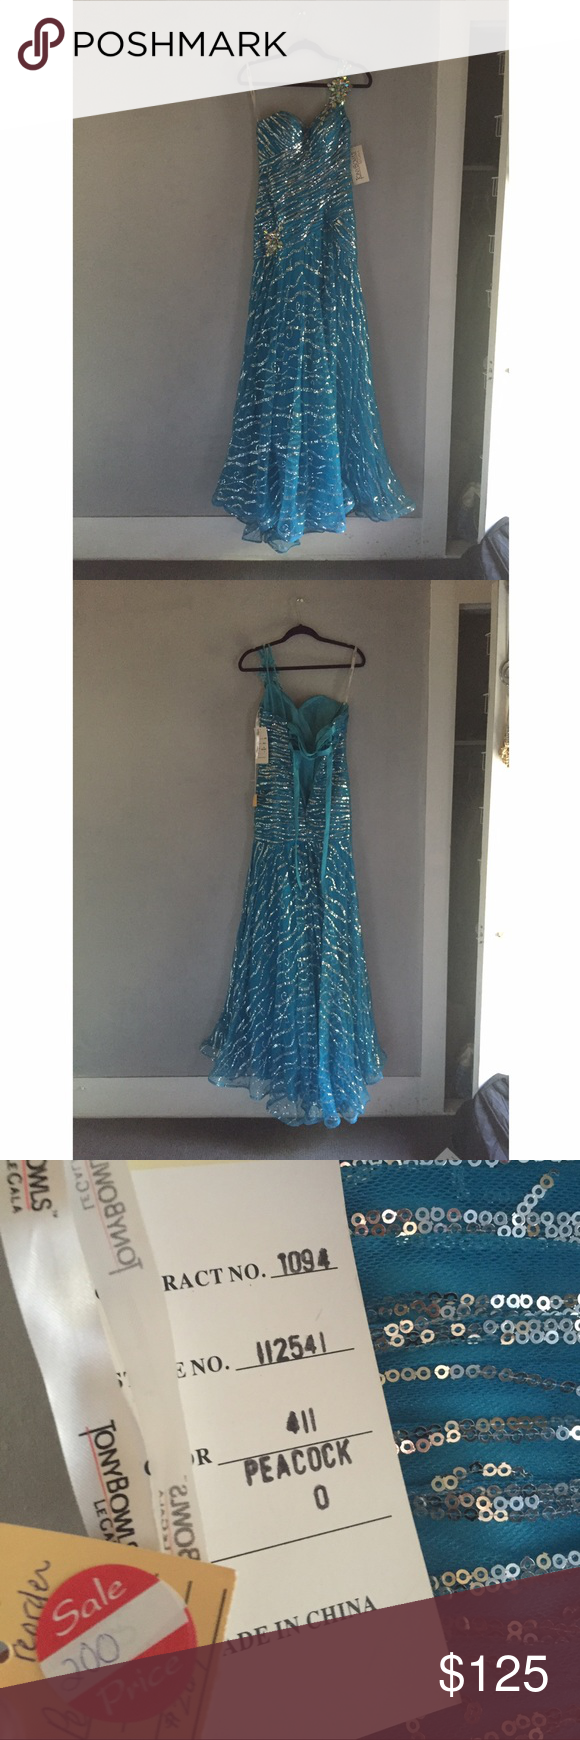 Prom dress beautiful prom dress light blue with silver glitter